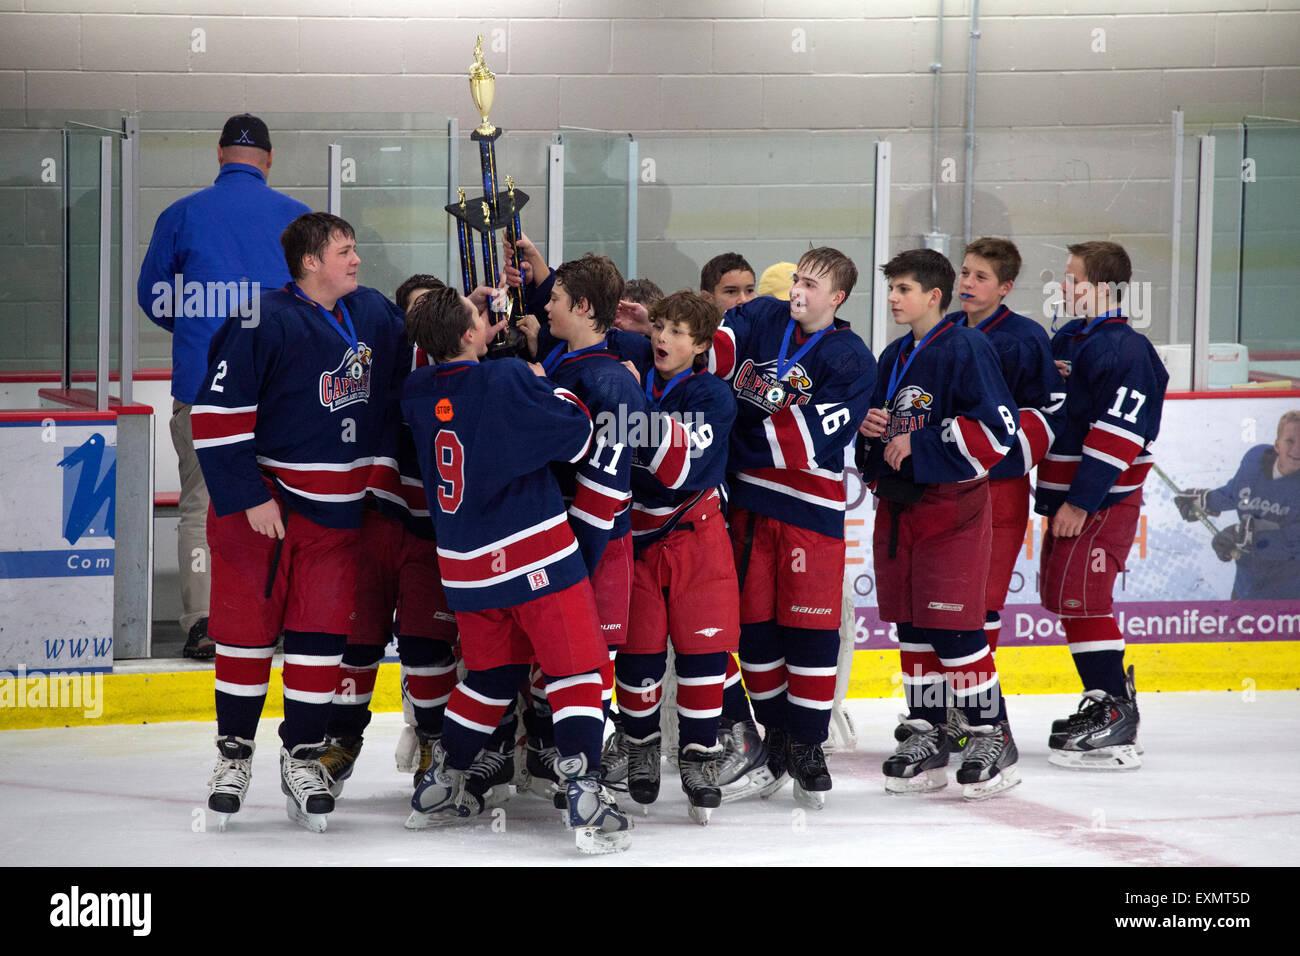 Young teen boys holding up hockey tournament winning trophy. Stillwater Minnesota MN USA - Stock Image